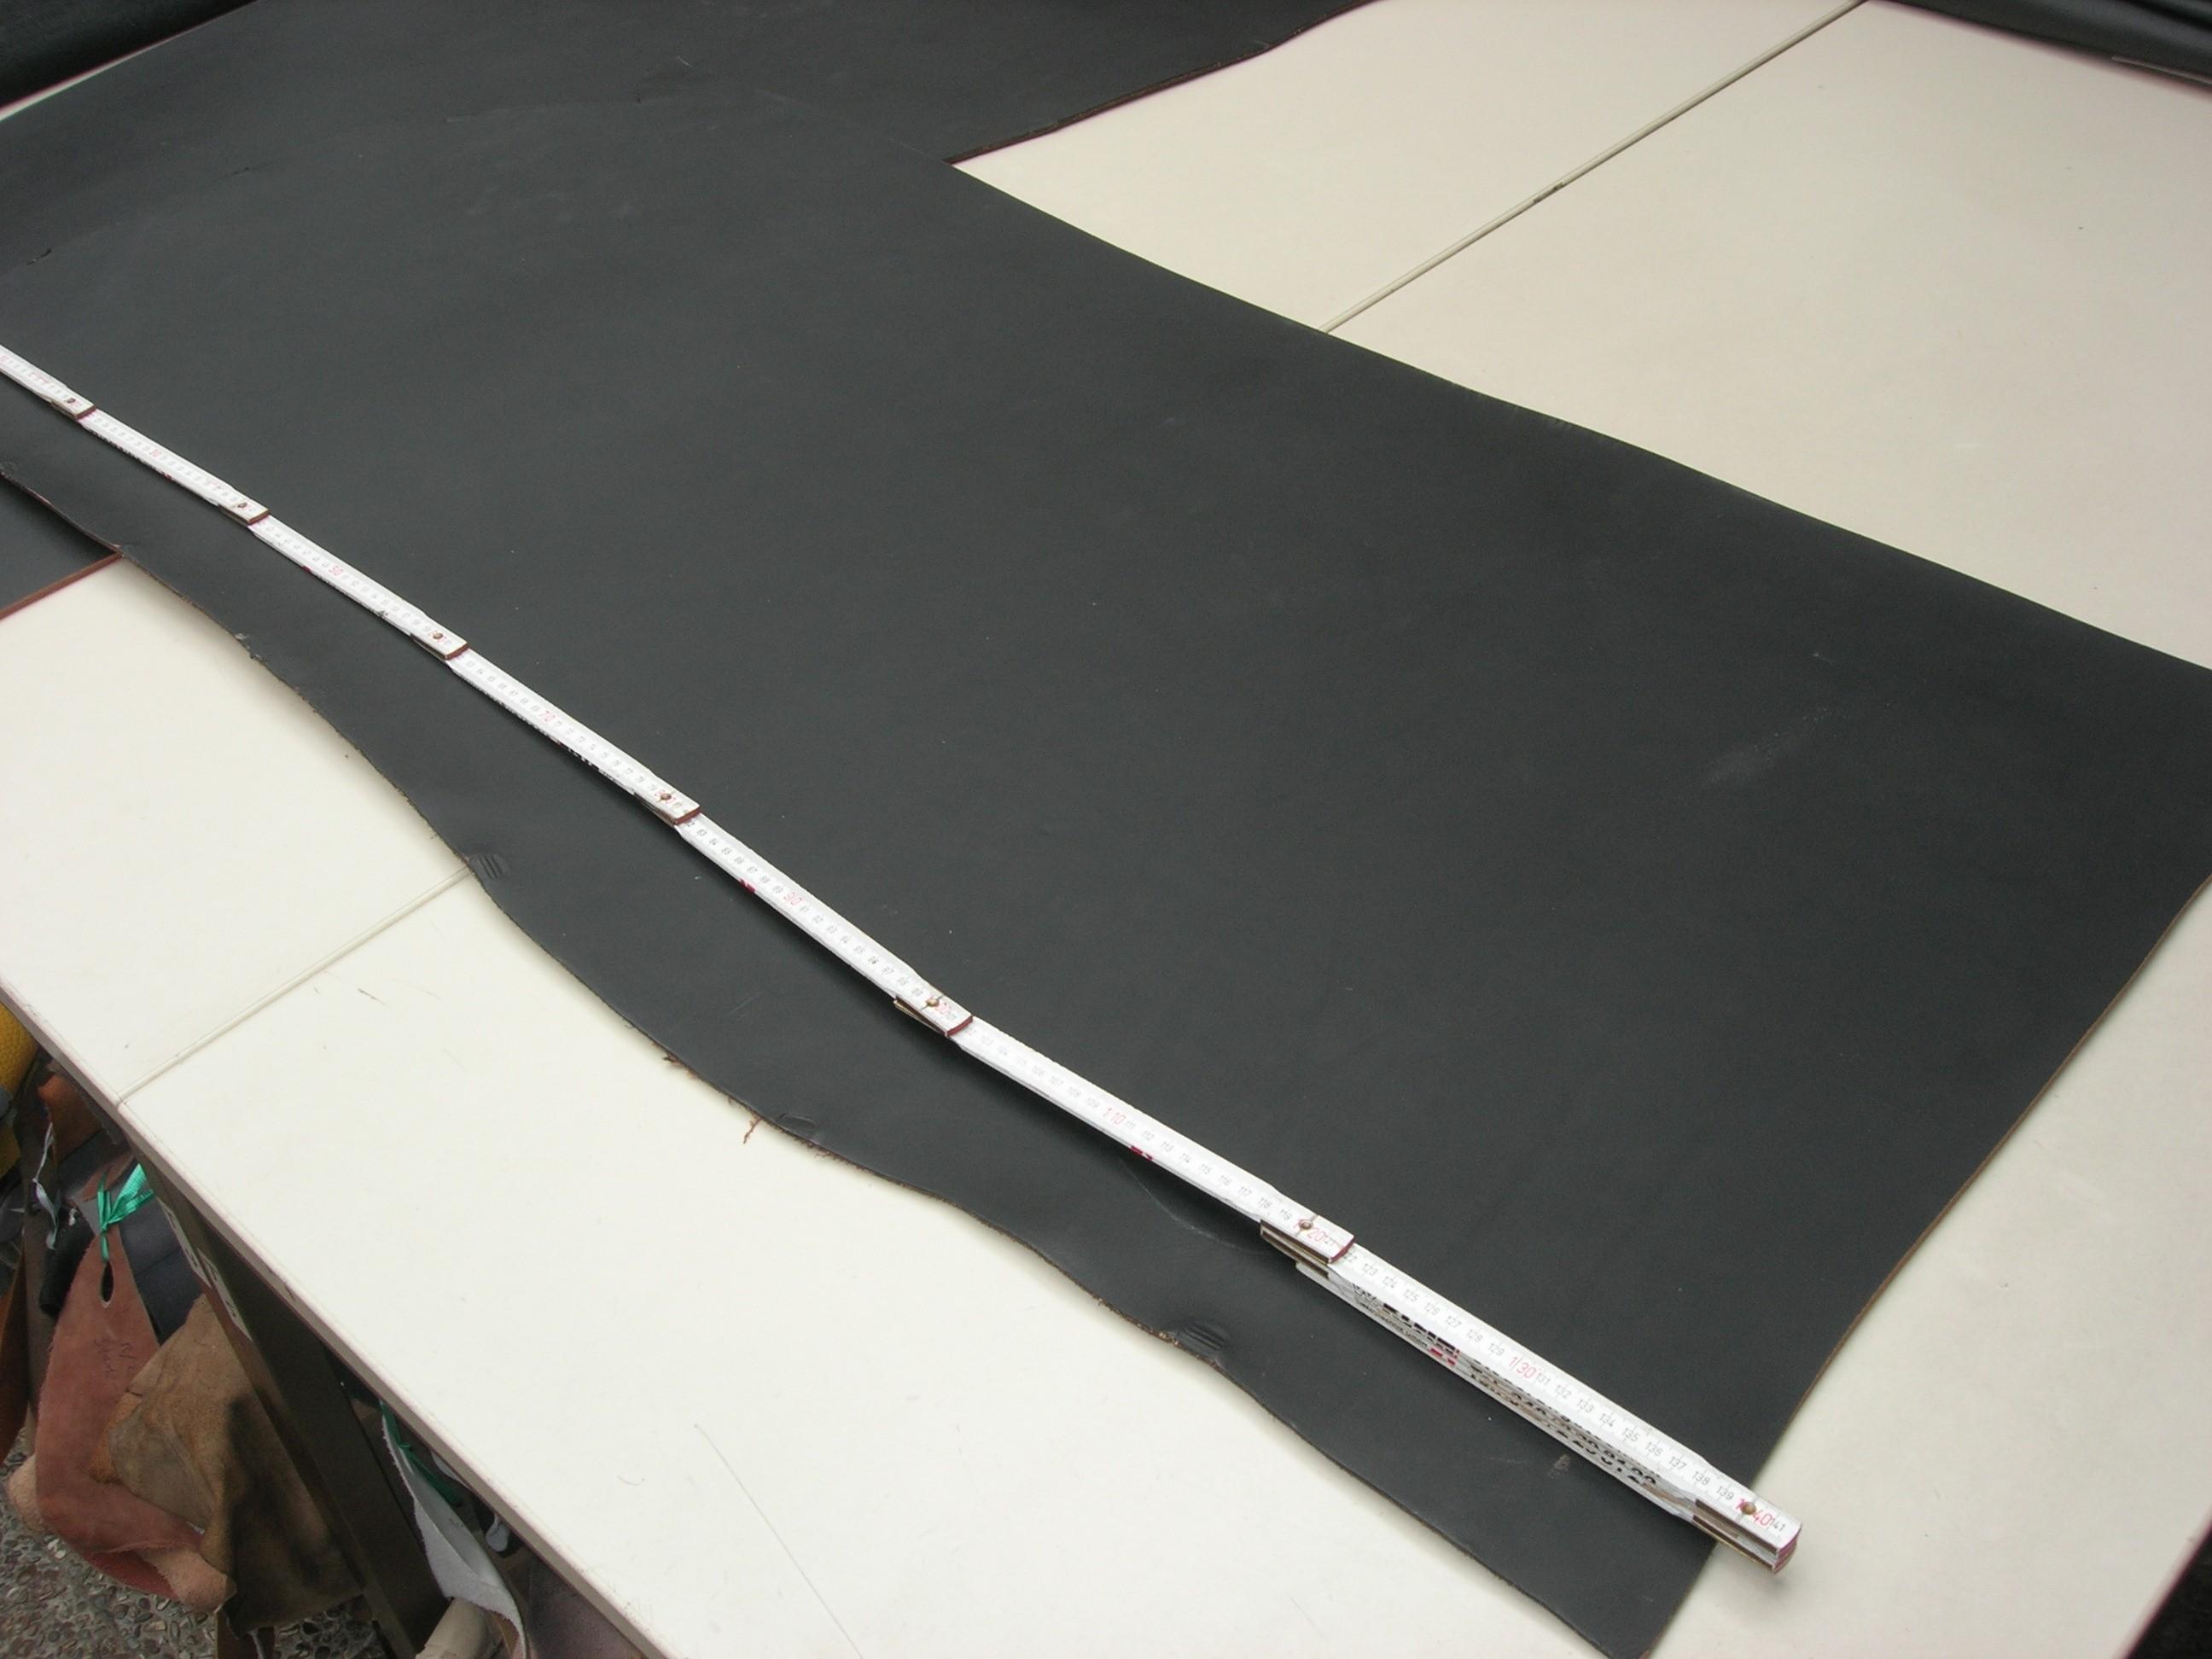 Rindcroupon schwarz kopfgedeckt 5-5,5mm (SK1824C)